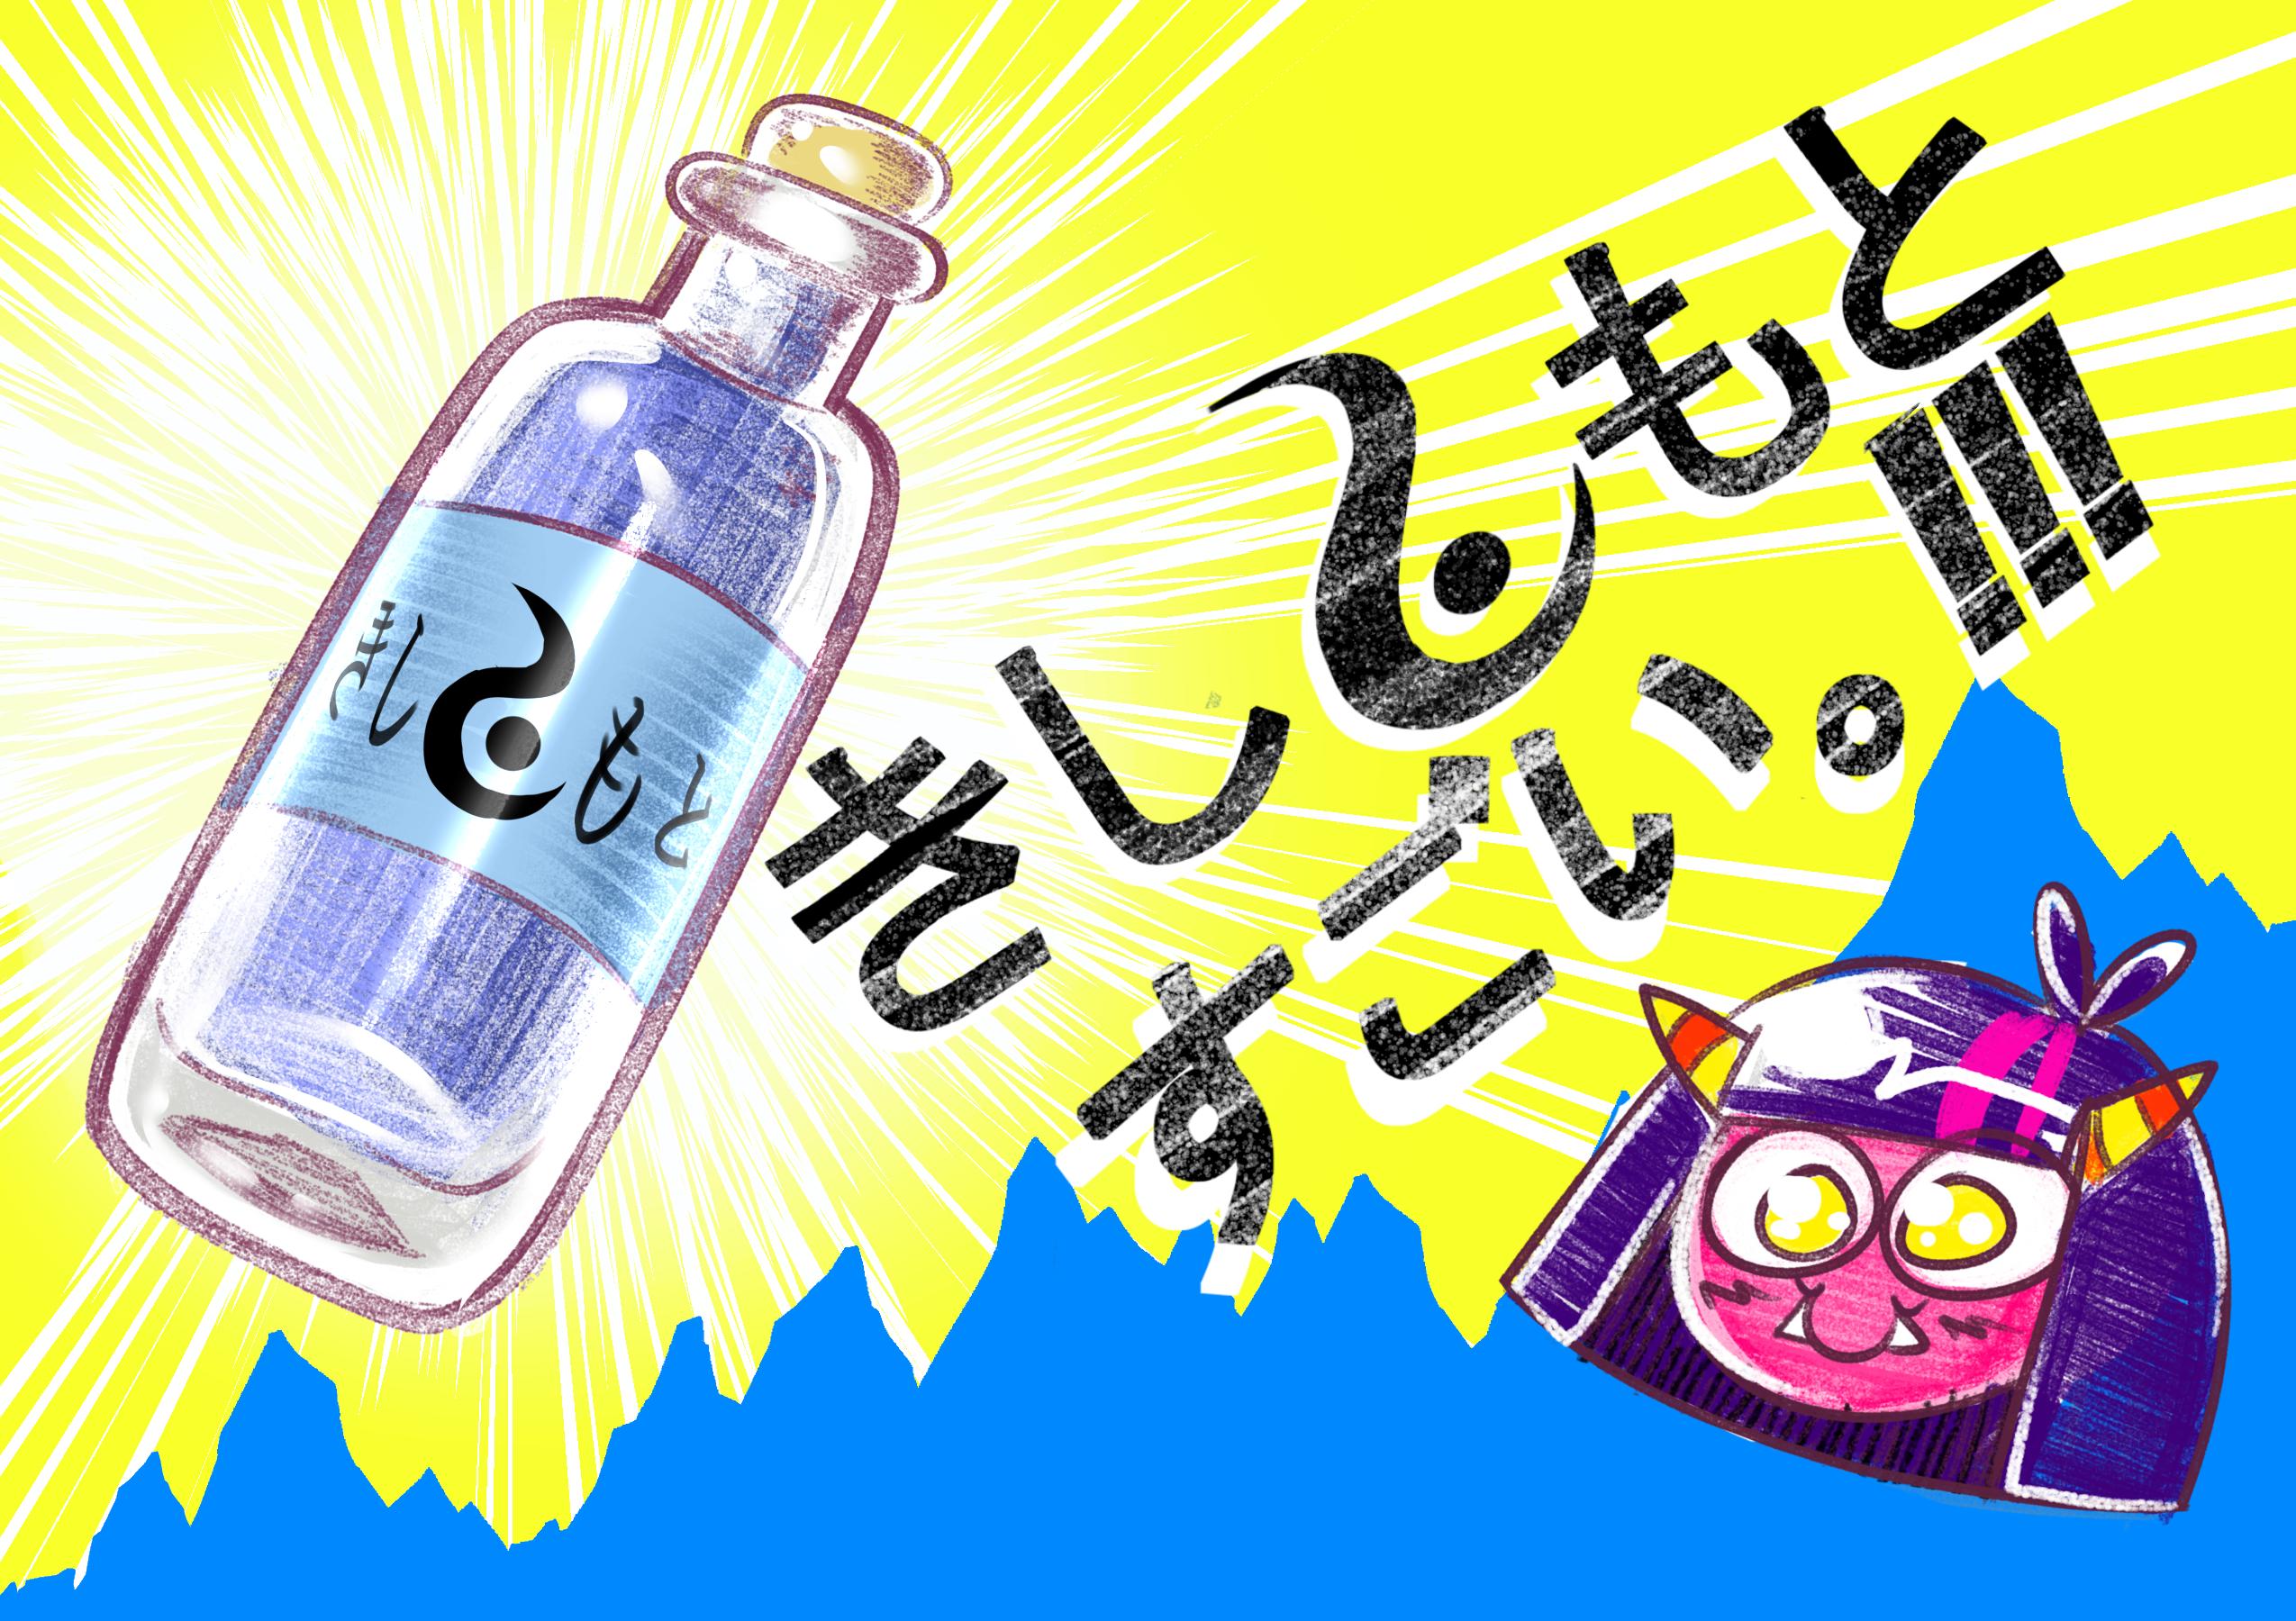 kishimoto_ad_by_onatart